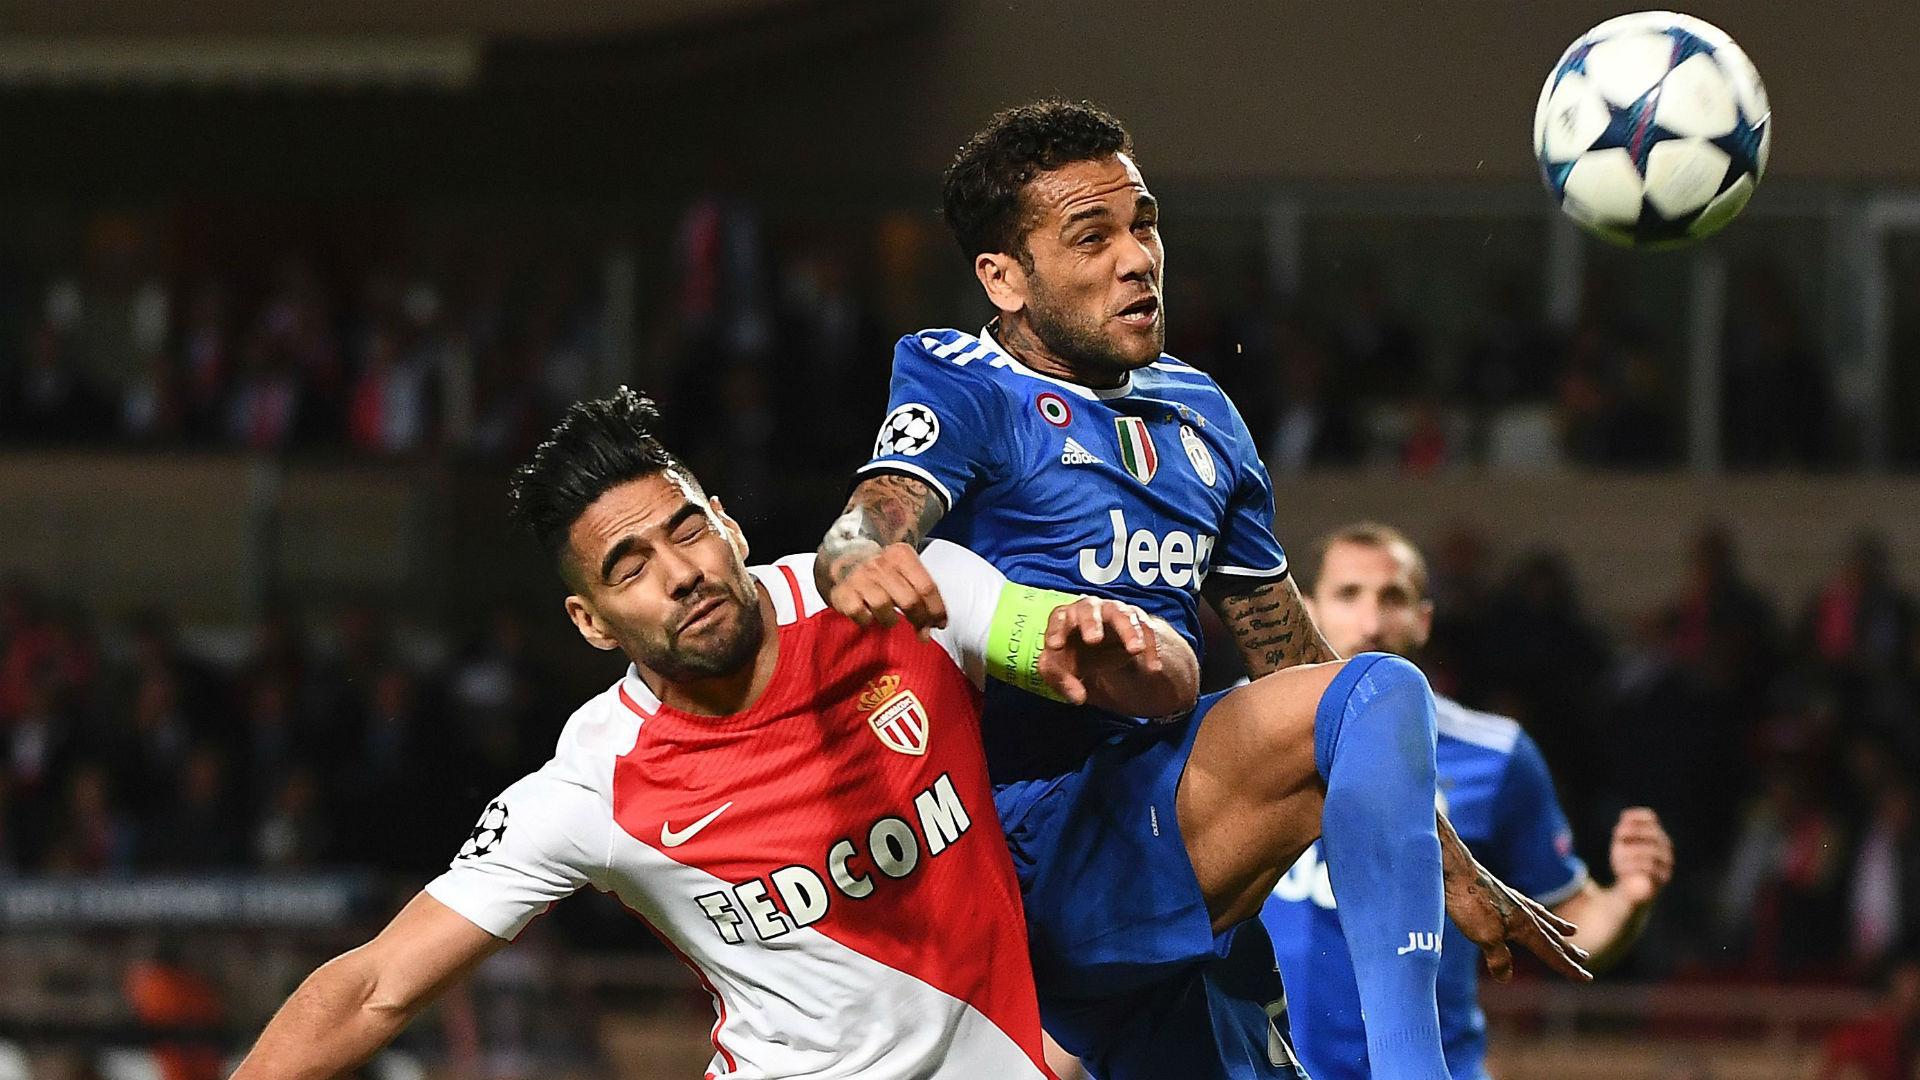 Dani Alves Radamel Falcao Monaco Juve 03052017